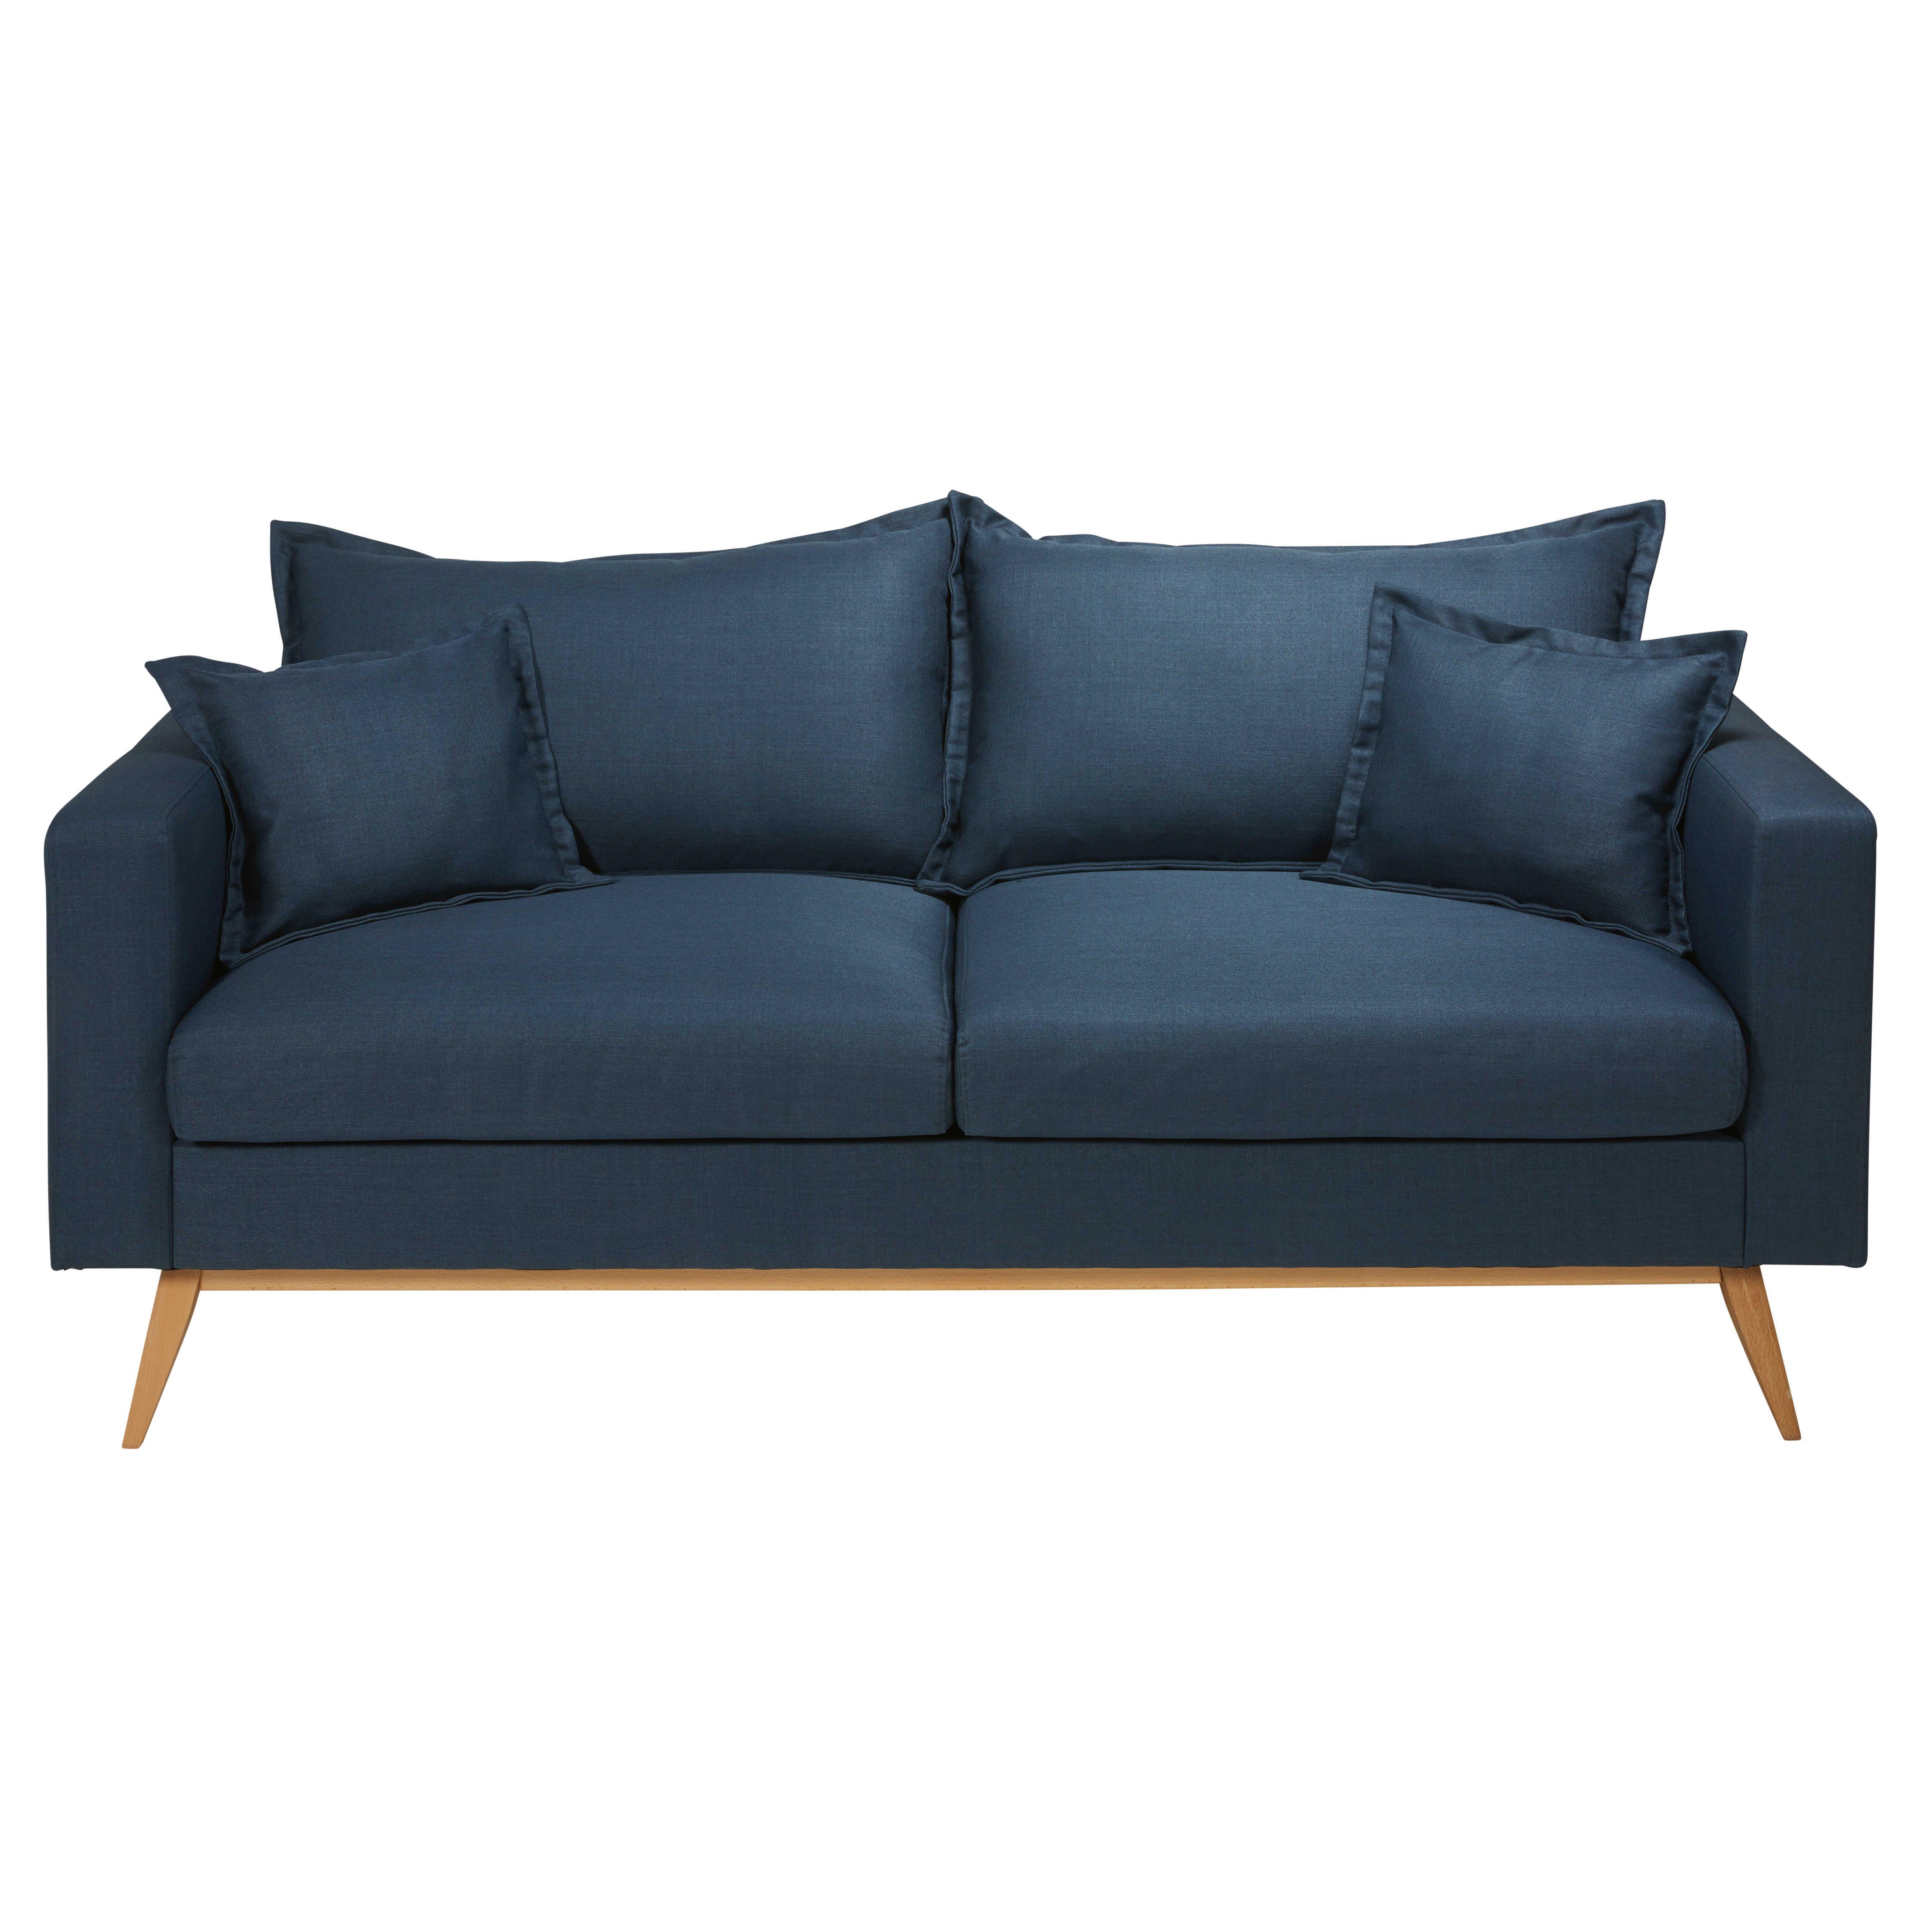 Midnight Blue 3 Seater Fabric Sofa Duke Sofa Cama Cama Apartamento